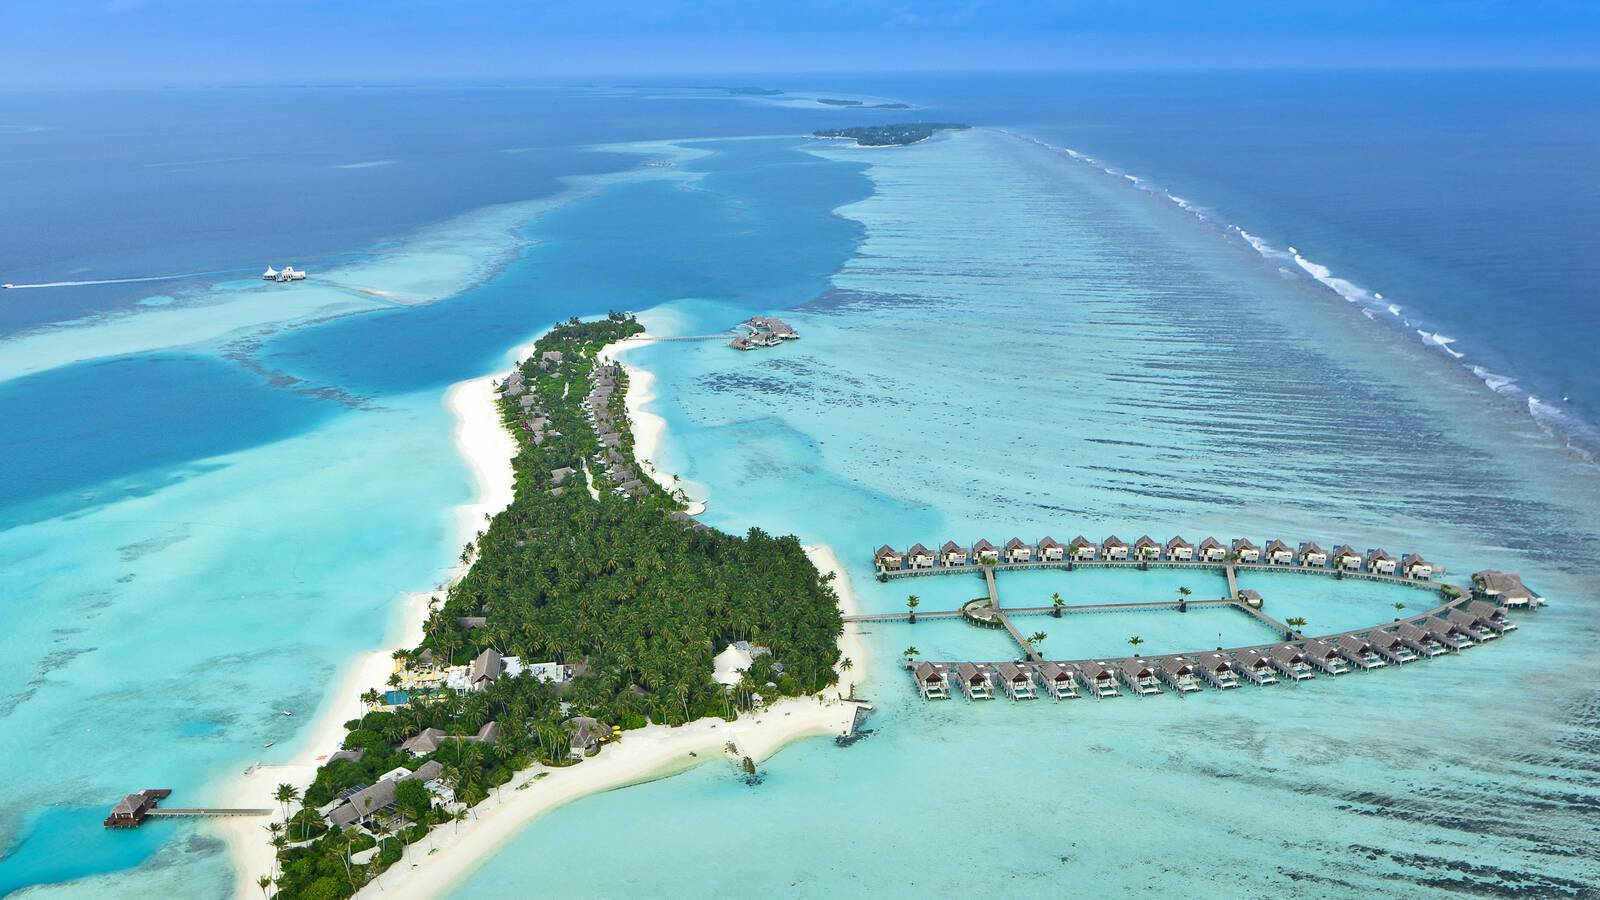 Niyama Maldives Vue Aerienne